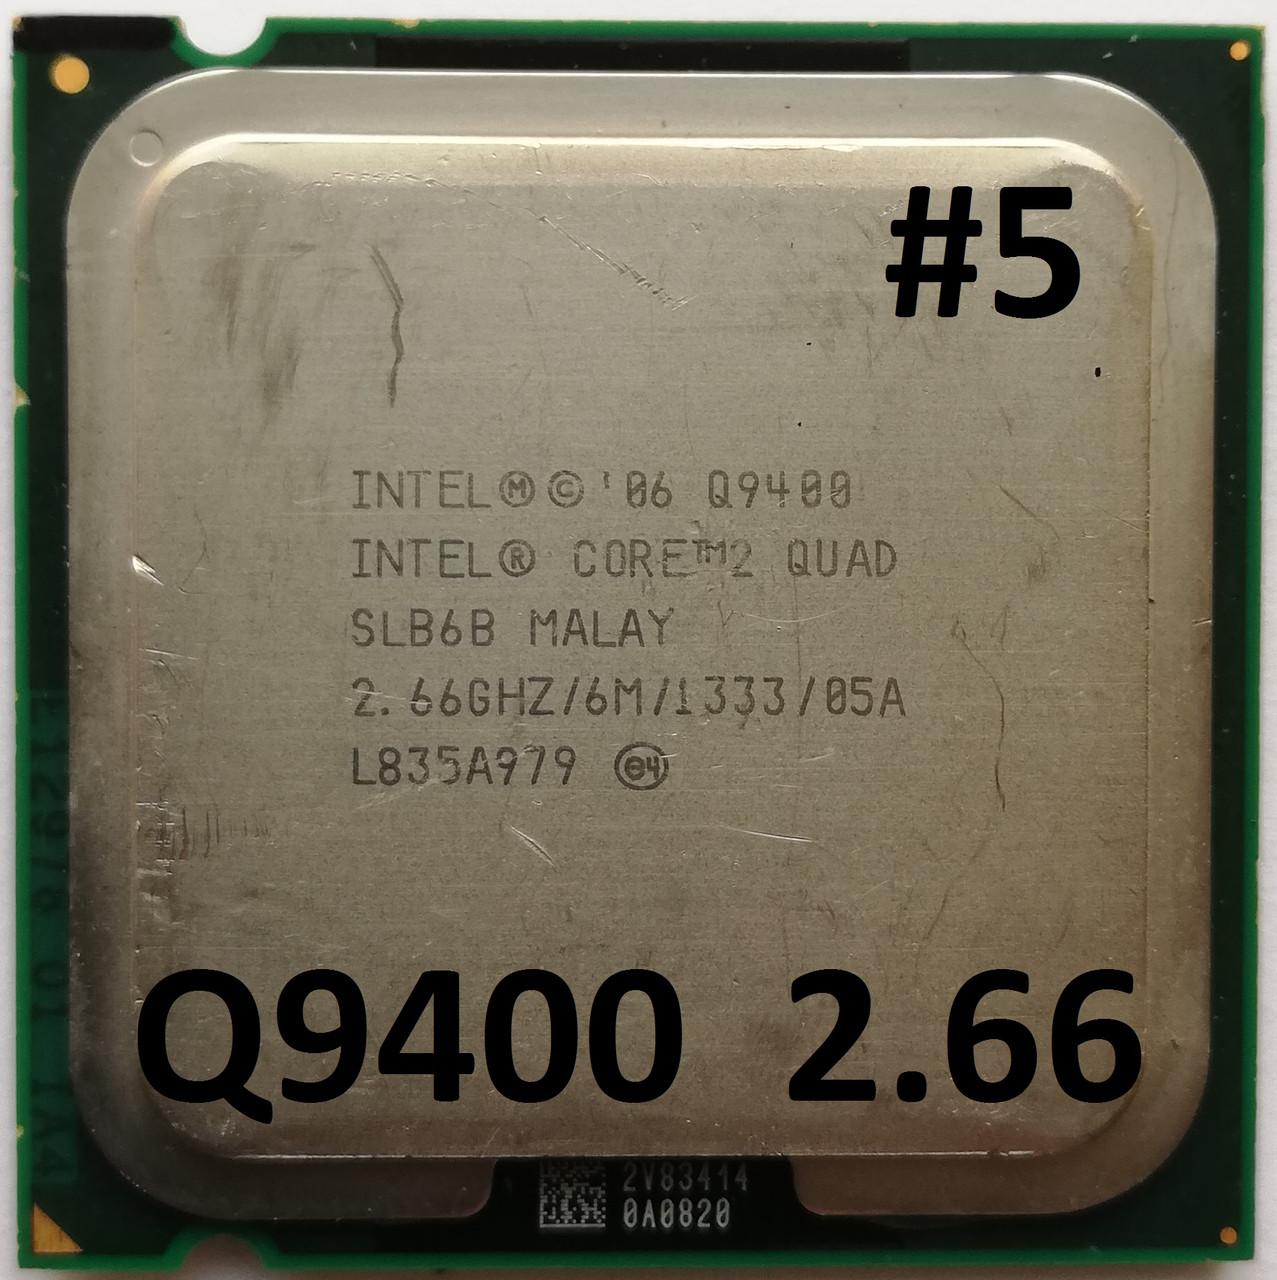 Процессор  ЛОТ #5 Intel® Core™2 Quad Q9400 R0 SLB6B 2.66GHz 6M Cache 1333 MHz FSB Soket 775 Б/У